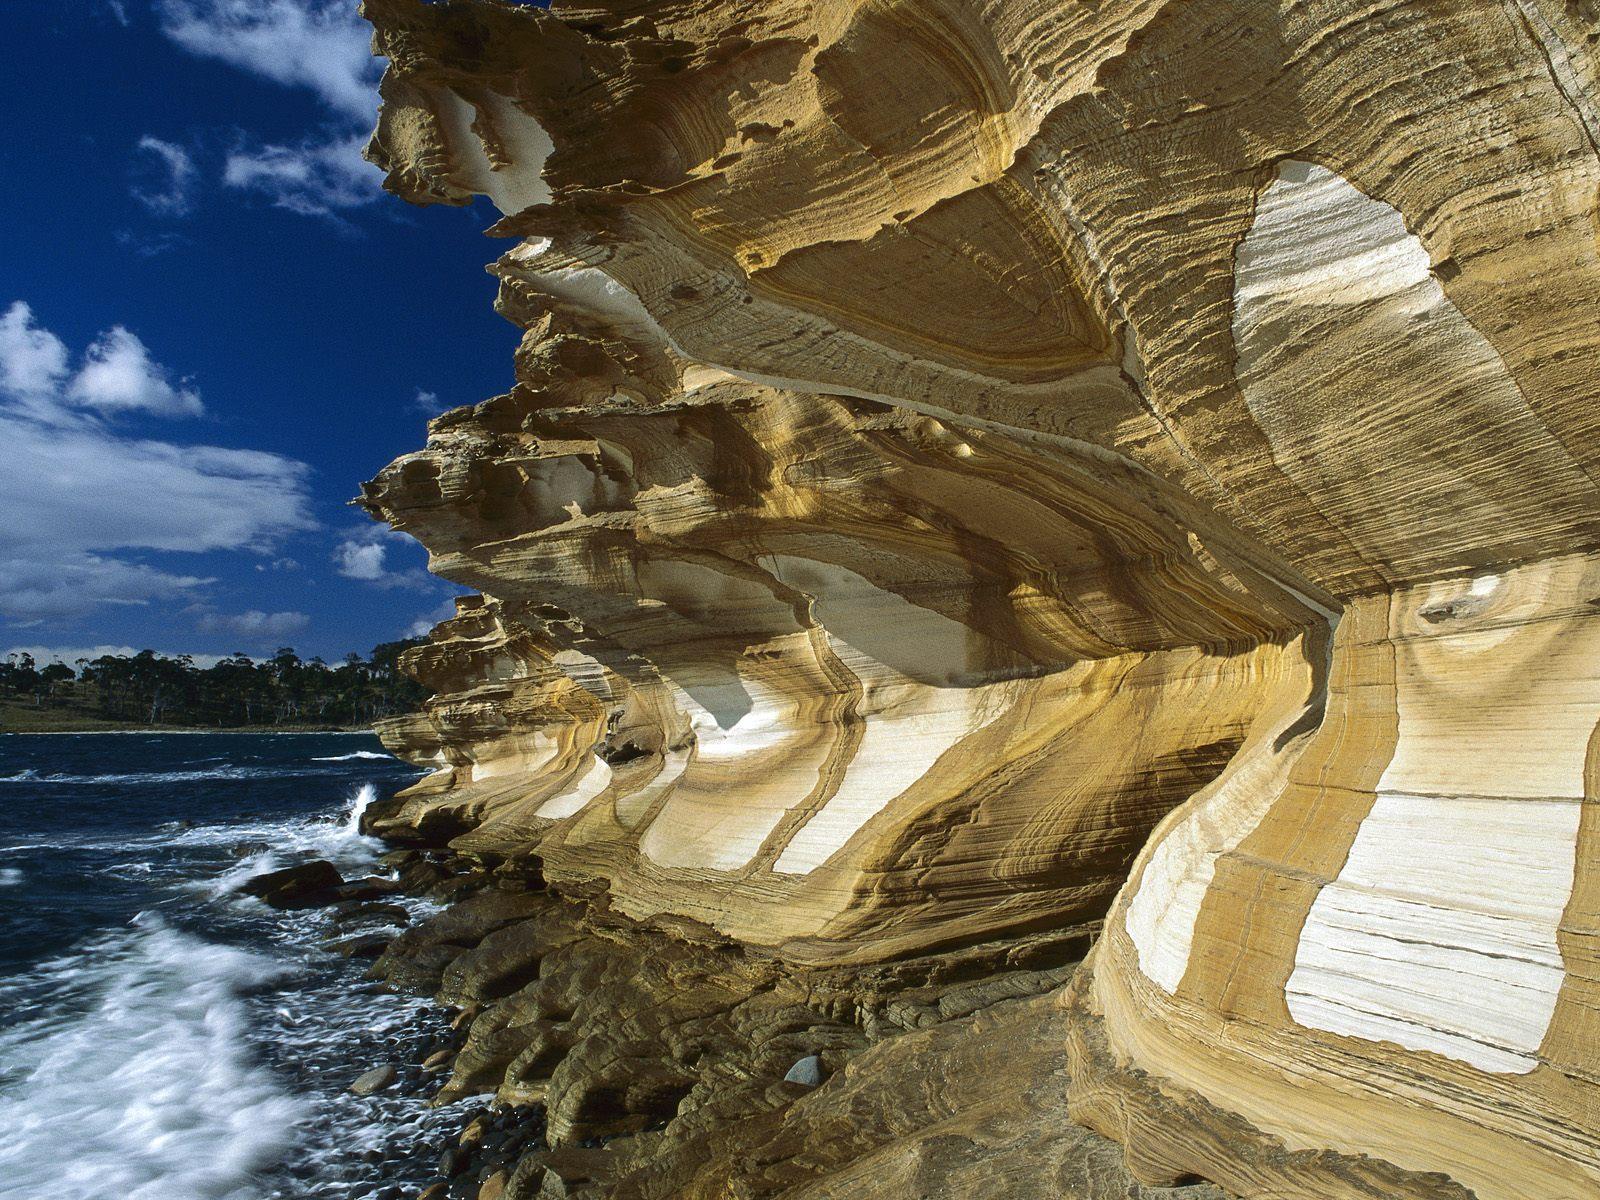 http://4.bp.blogspot.com/-QiWRIJTSwdE/ULc_OIROWeI/AAAAAAAAOHA/HDpLjwBYL4w/s1600/Tasmania%2B(7).jpg